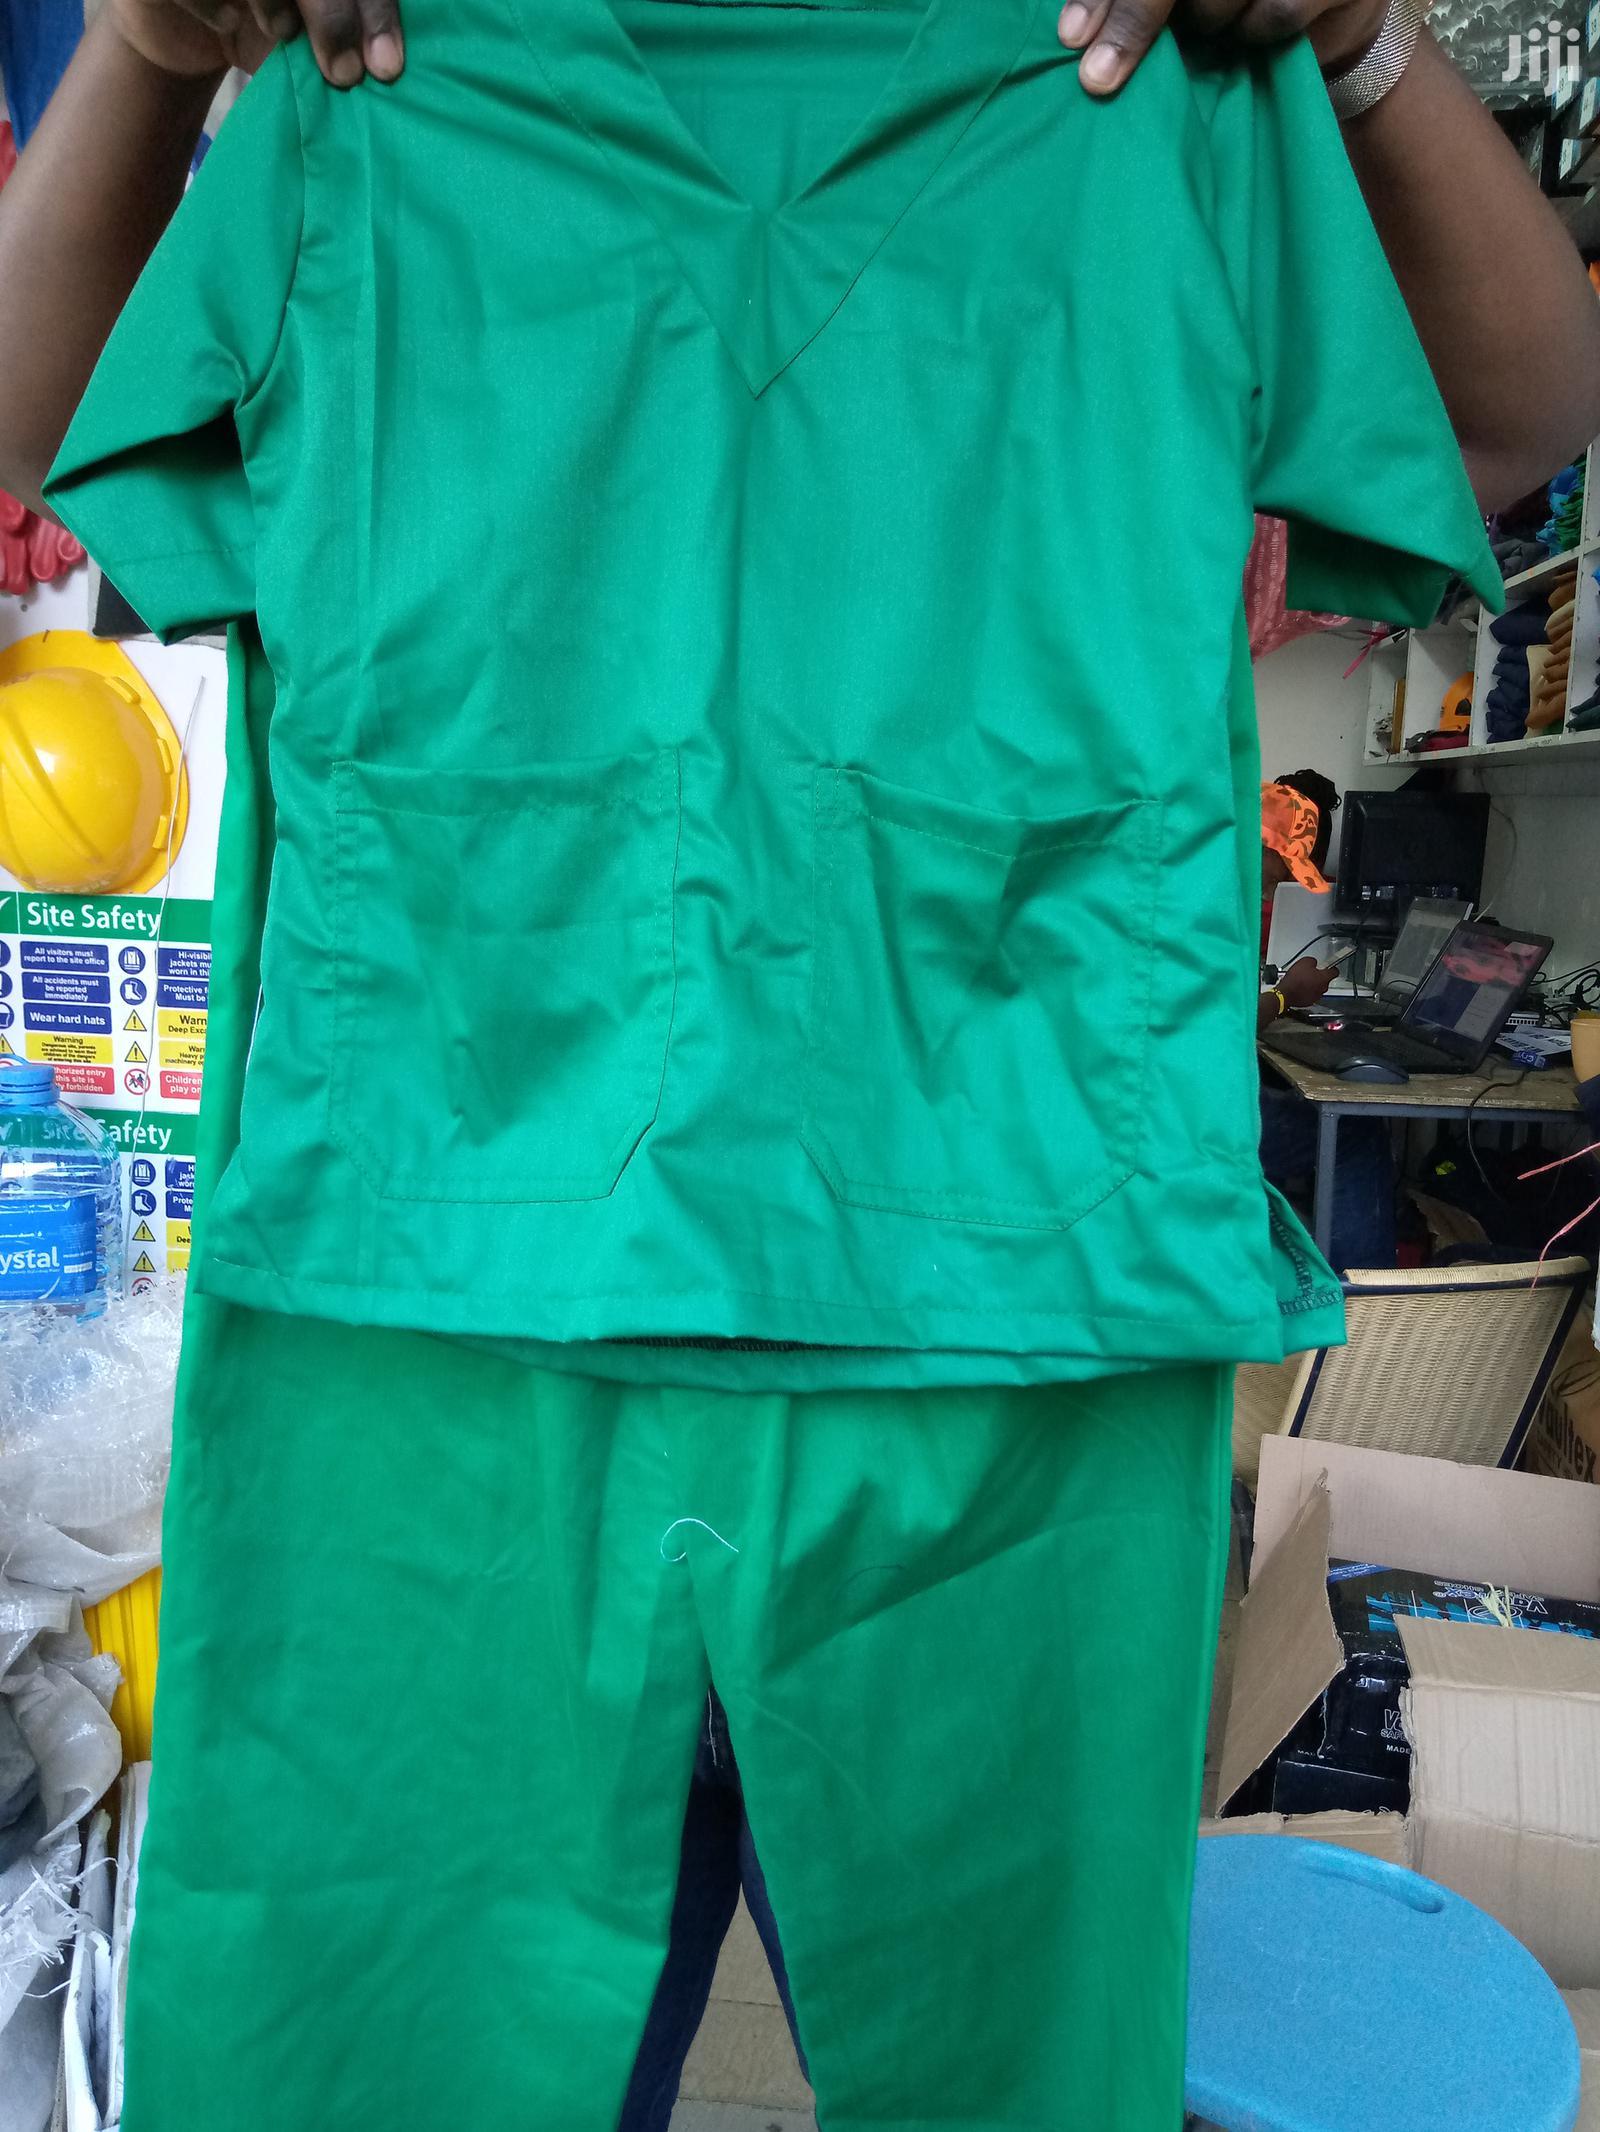 Medical Scrubs For Sale